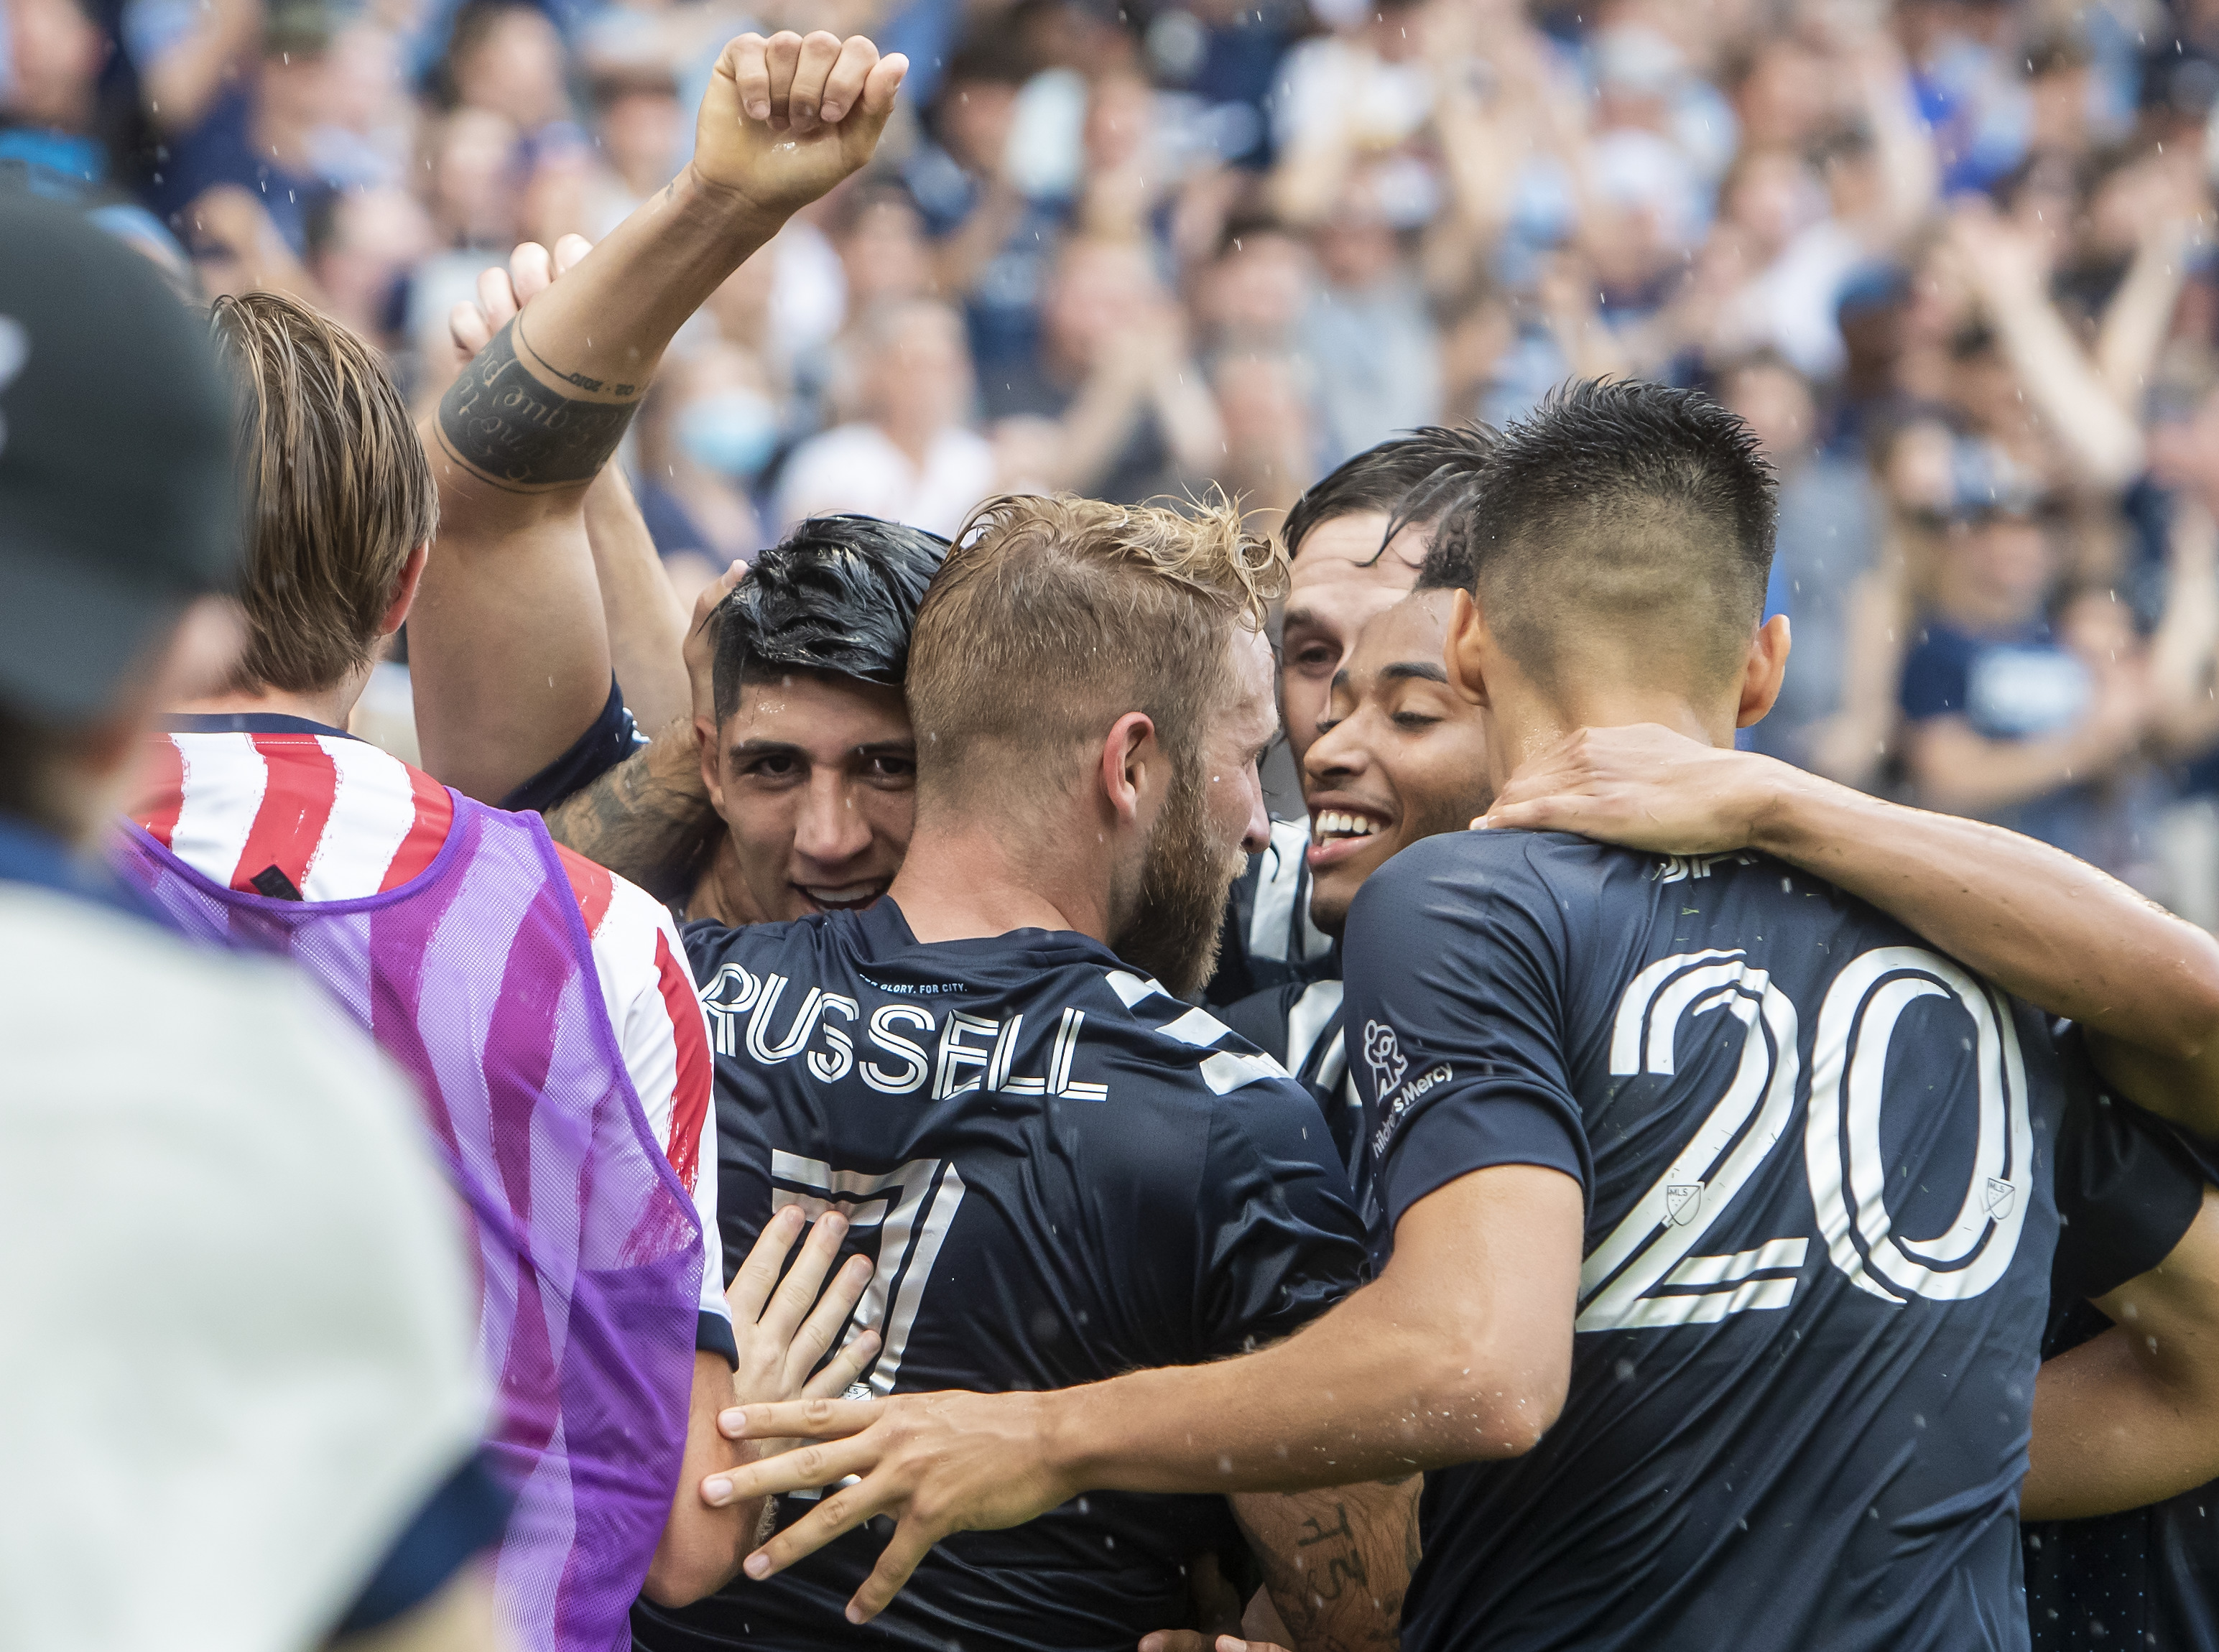 SOCCER: JUN 26 MLS - LAFC at Sporting Kansas City